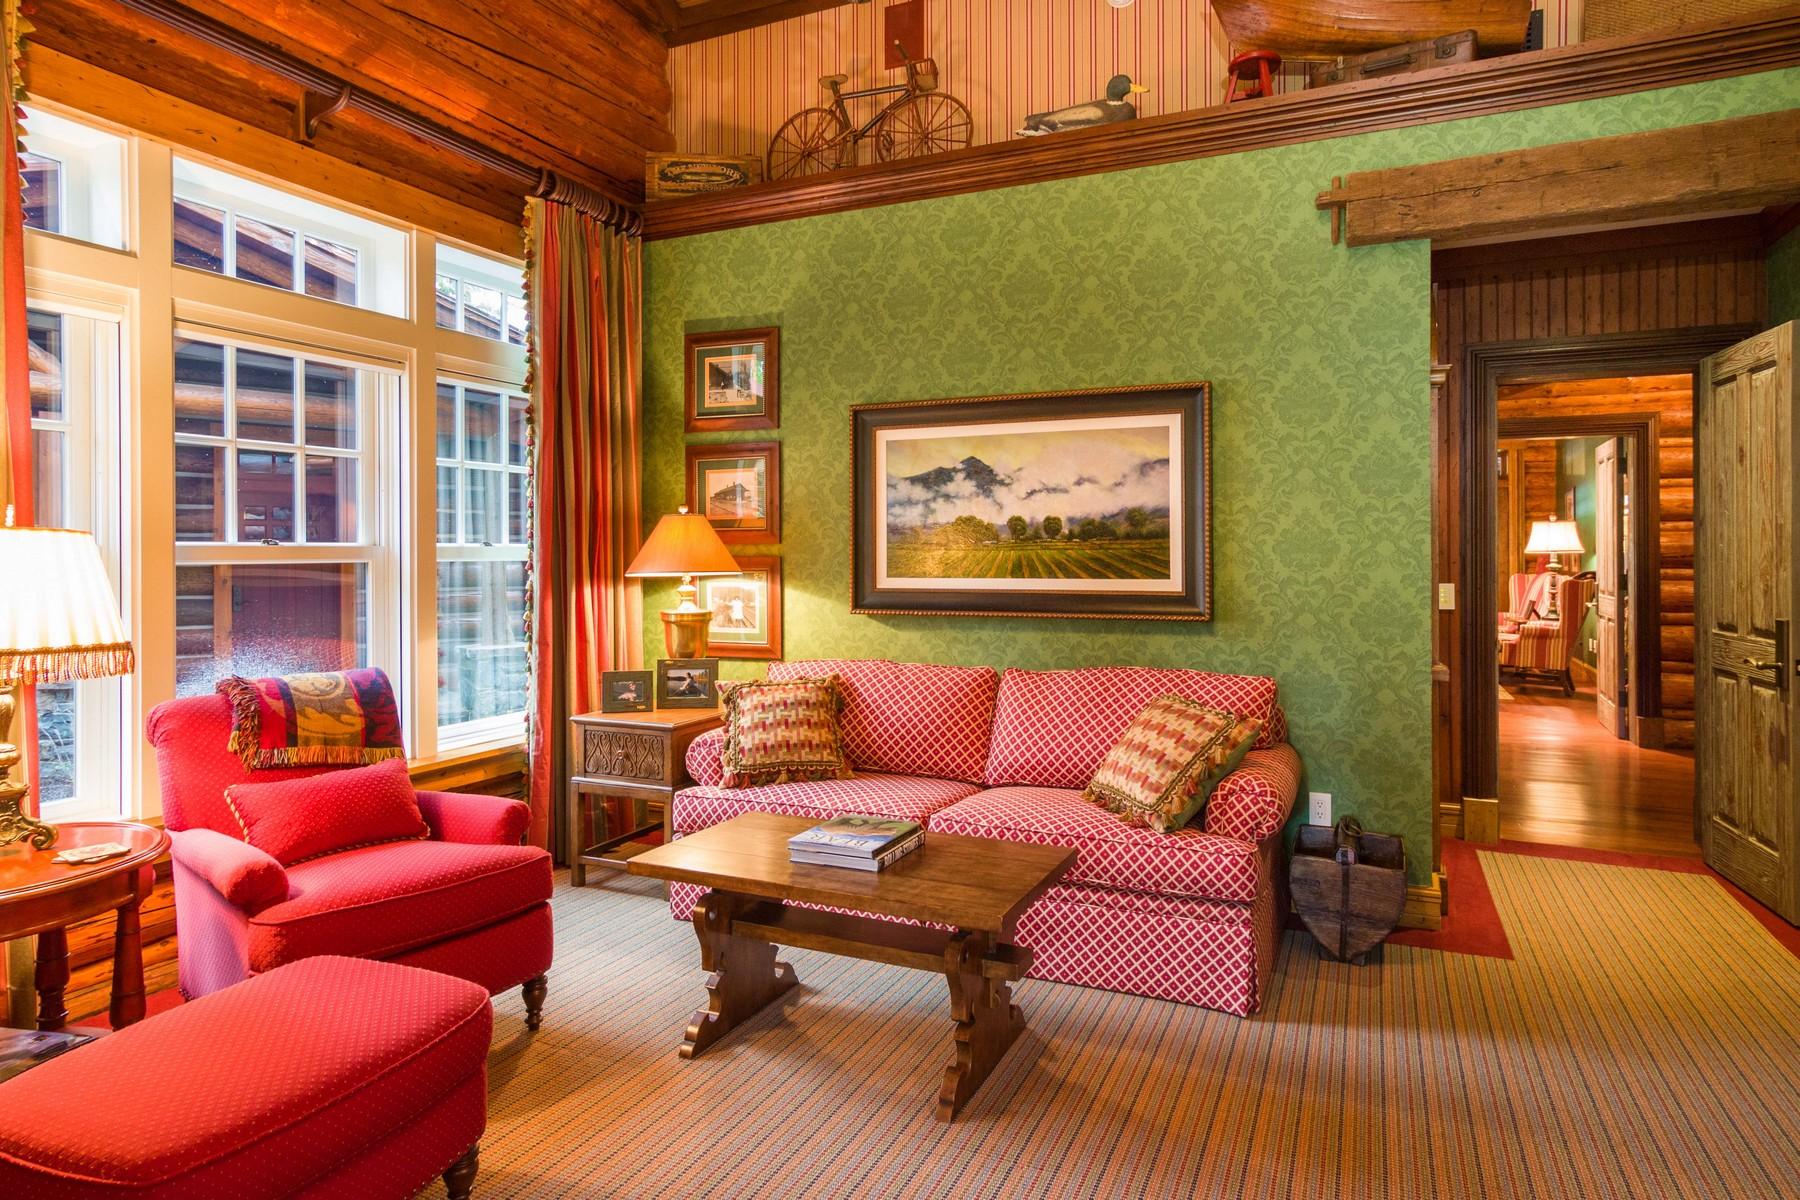 Additional photo for property listing at Historic Swan Lake 13474  River Run Loop Bigfork, Montana 59911 United States